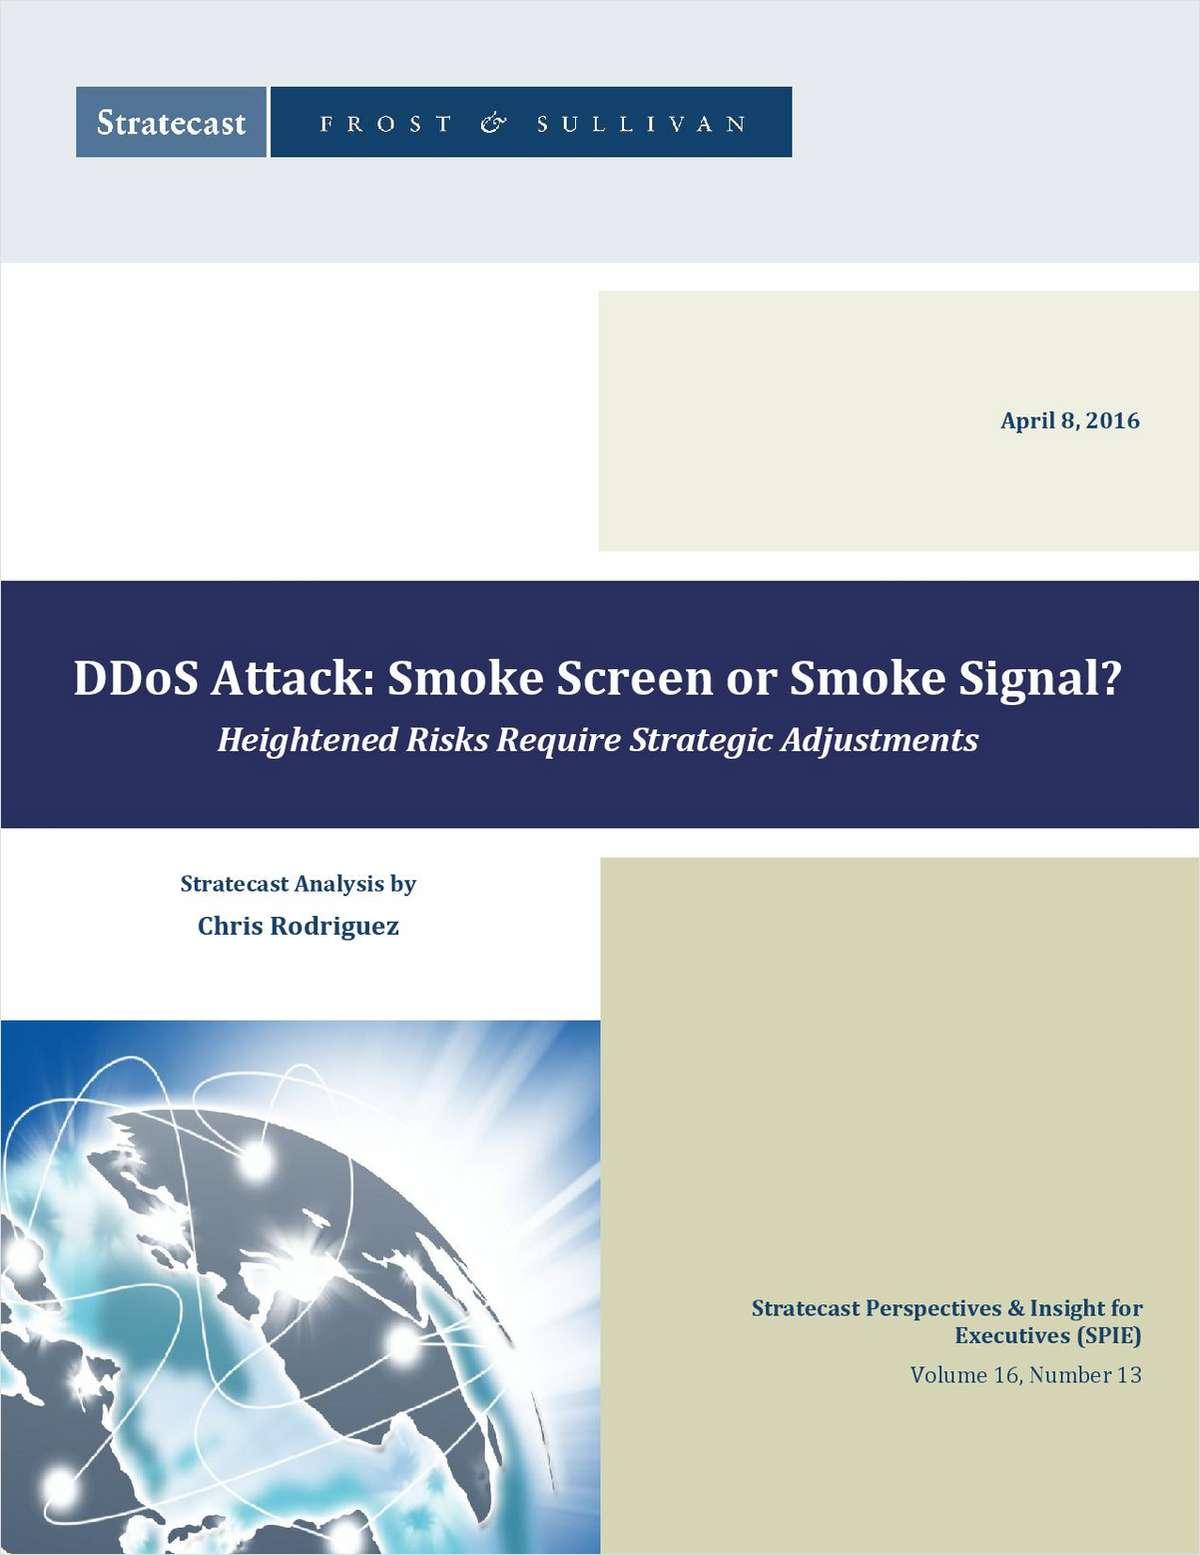 ddos attack smoke screen or smoke signal free arbor networks